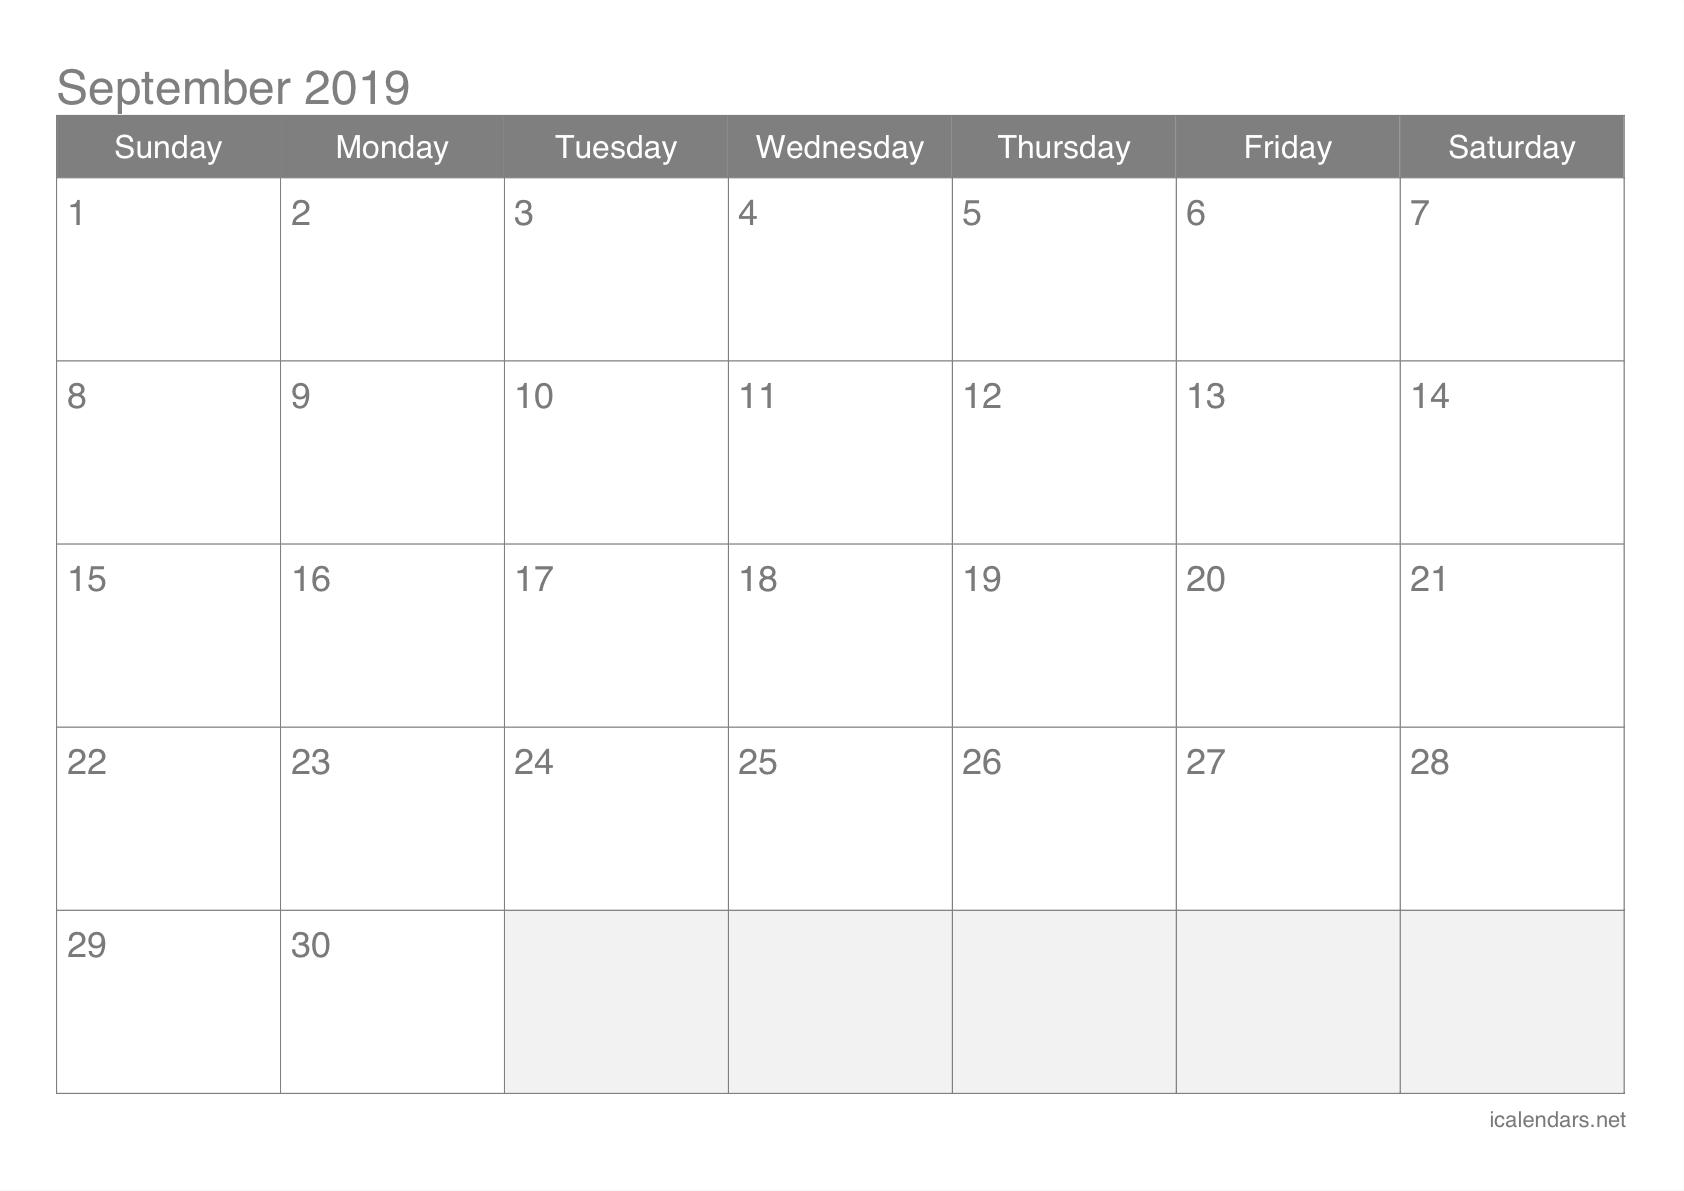 September 2019 Printable Calendar - Icalendars